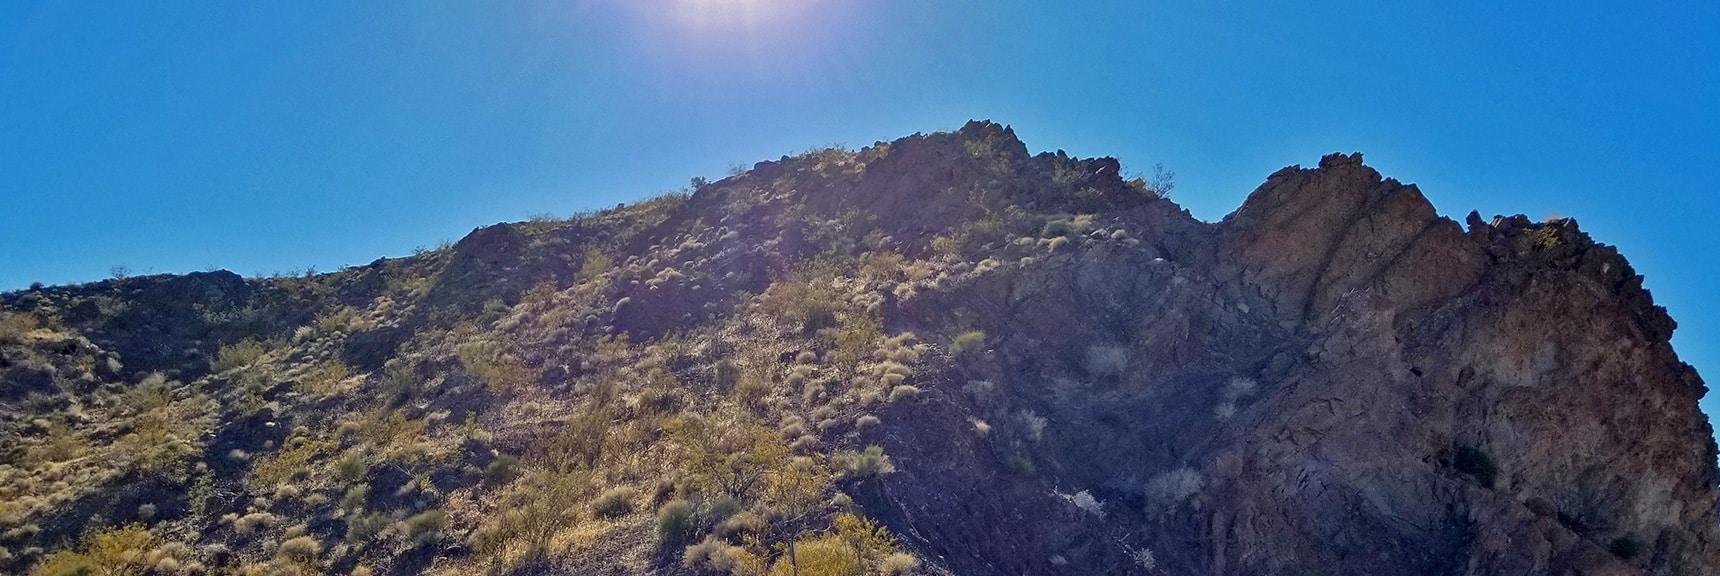 Approaching Hamblin Mt. Summit | Hamblin Mountain, Lake Mead National Conservation Area, Nevada